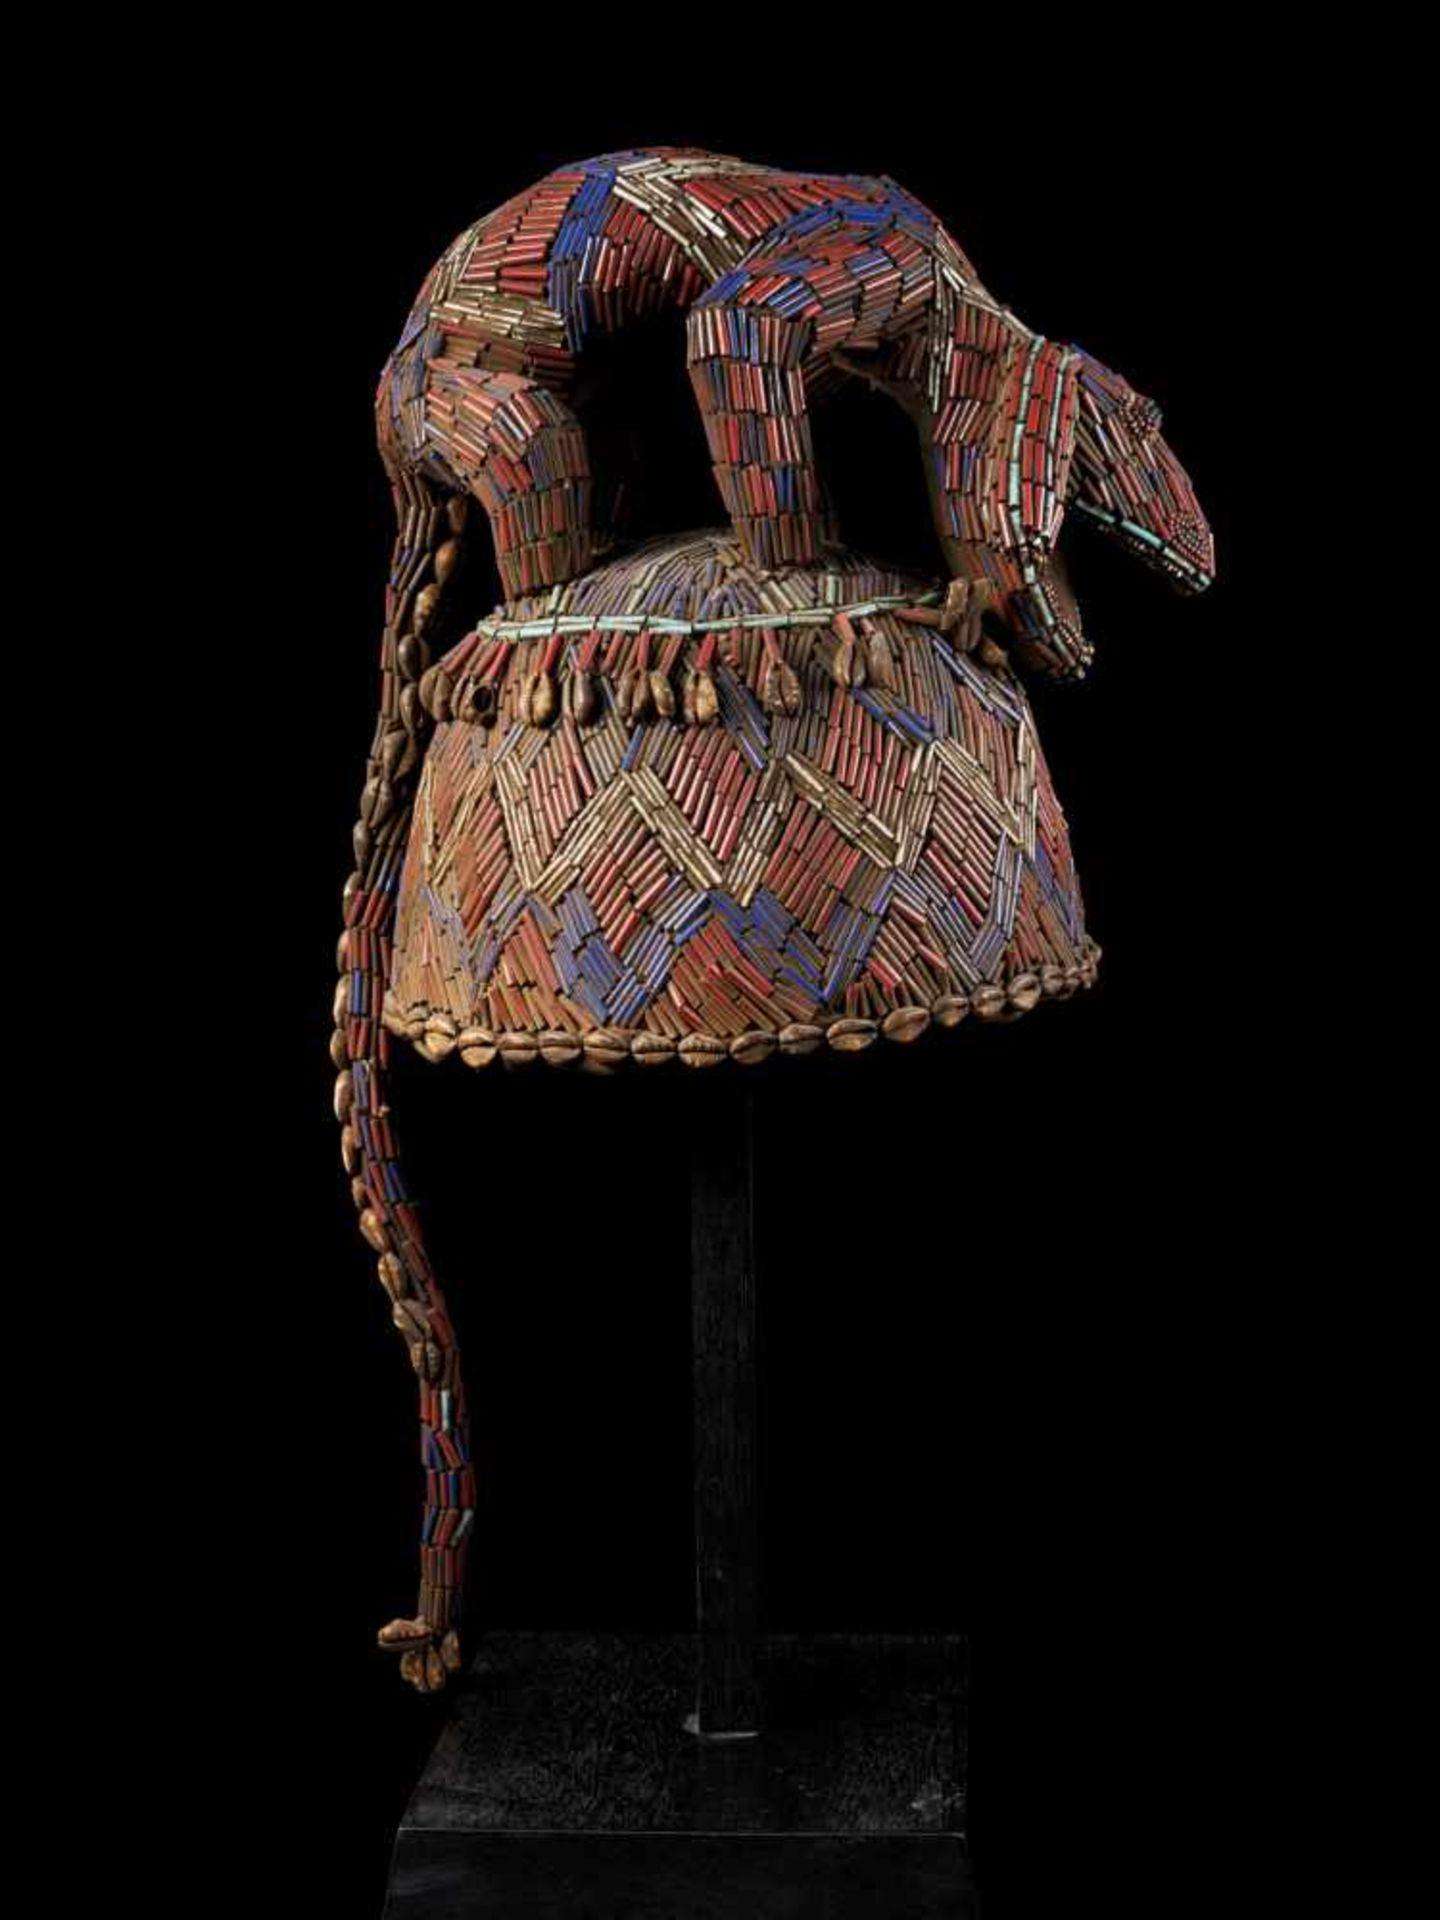 Beaded Blue Headdress With Kauris Finish - Tribal ArtThis impressive headdress is delightfully - Bild 5 aus 5